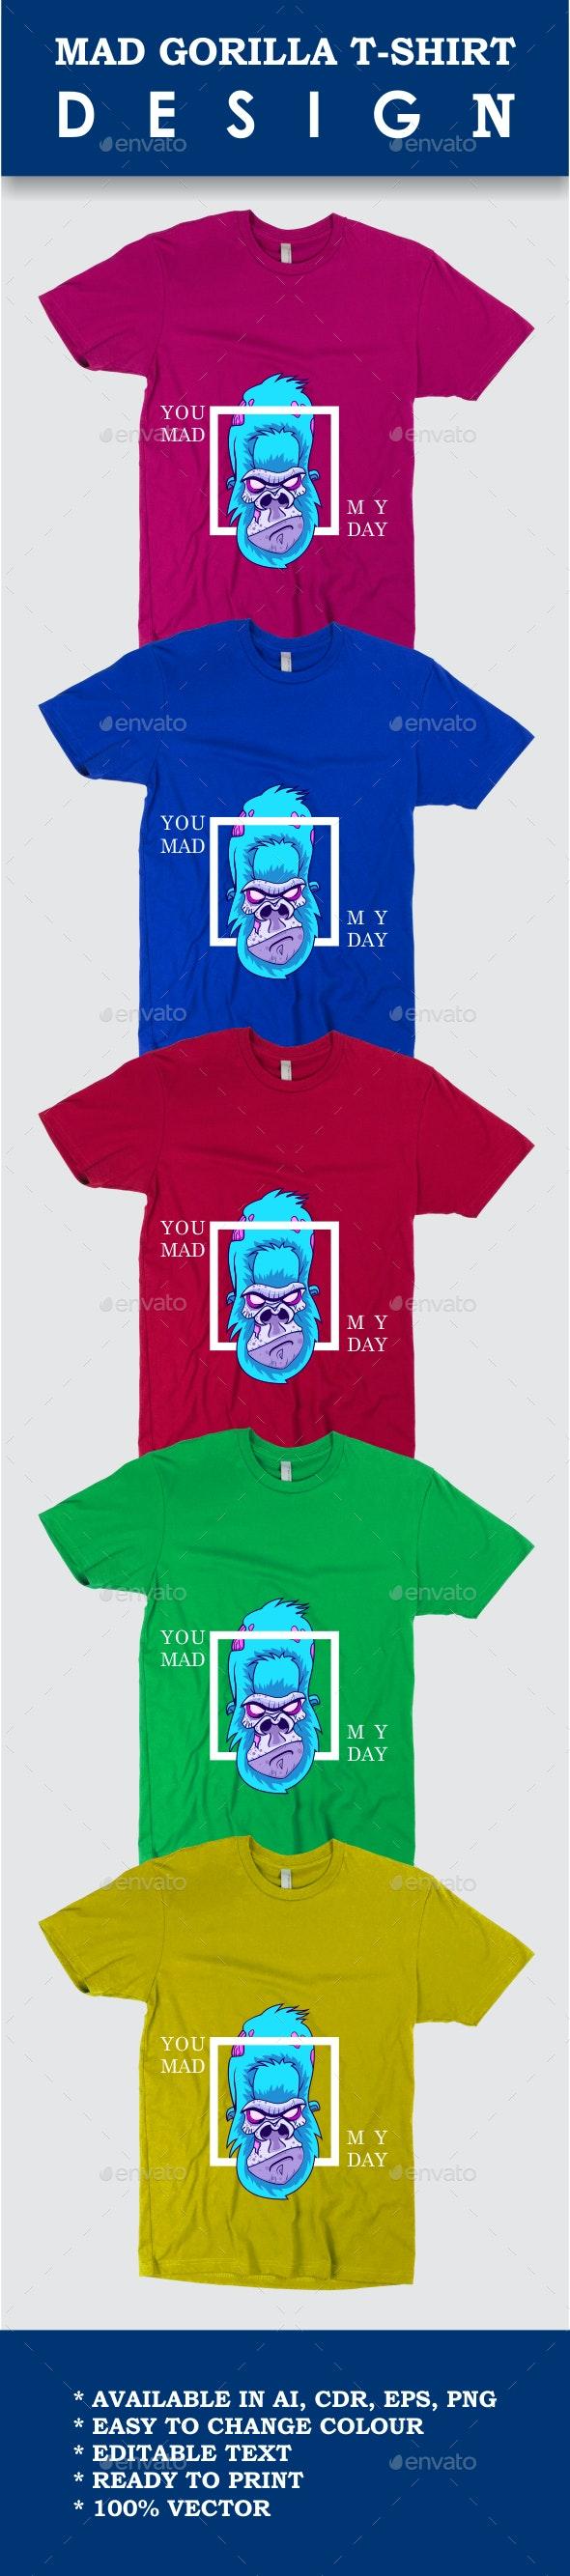 Mad Gorilla T-Shirt Design - Designs T-Shirts